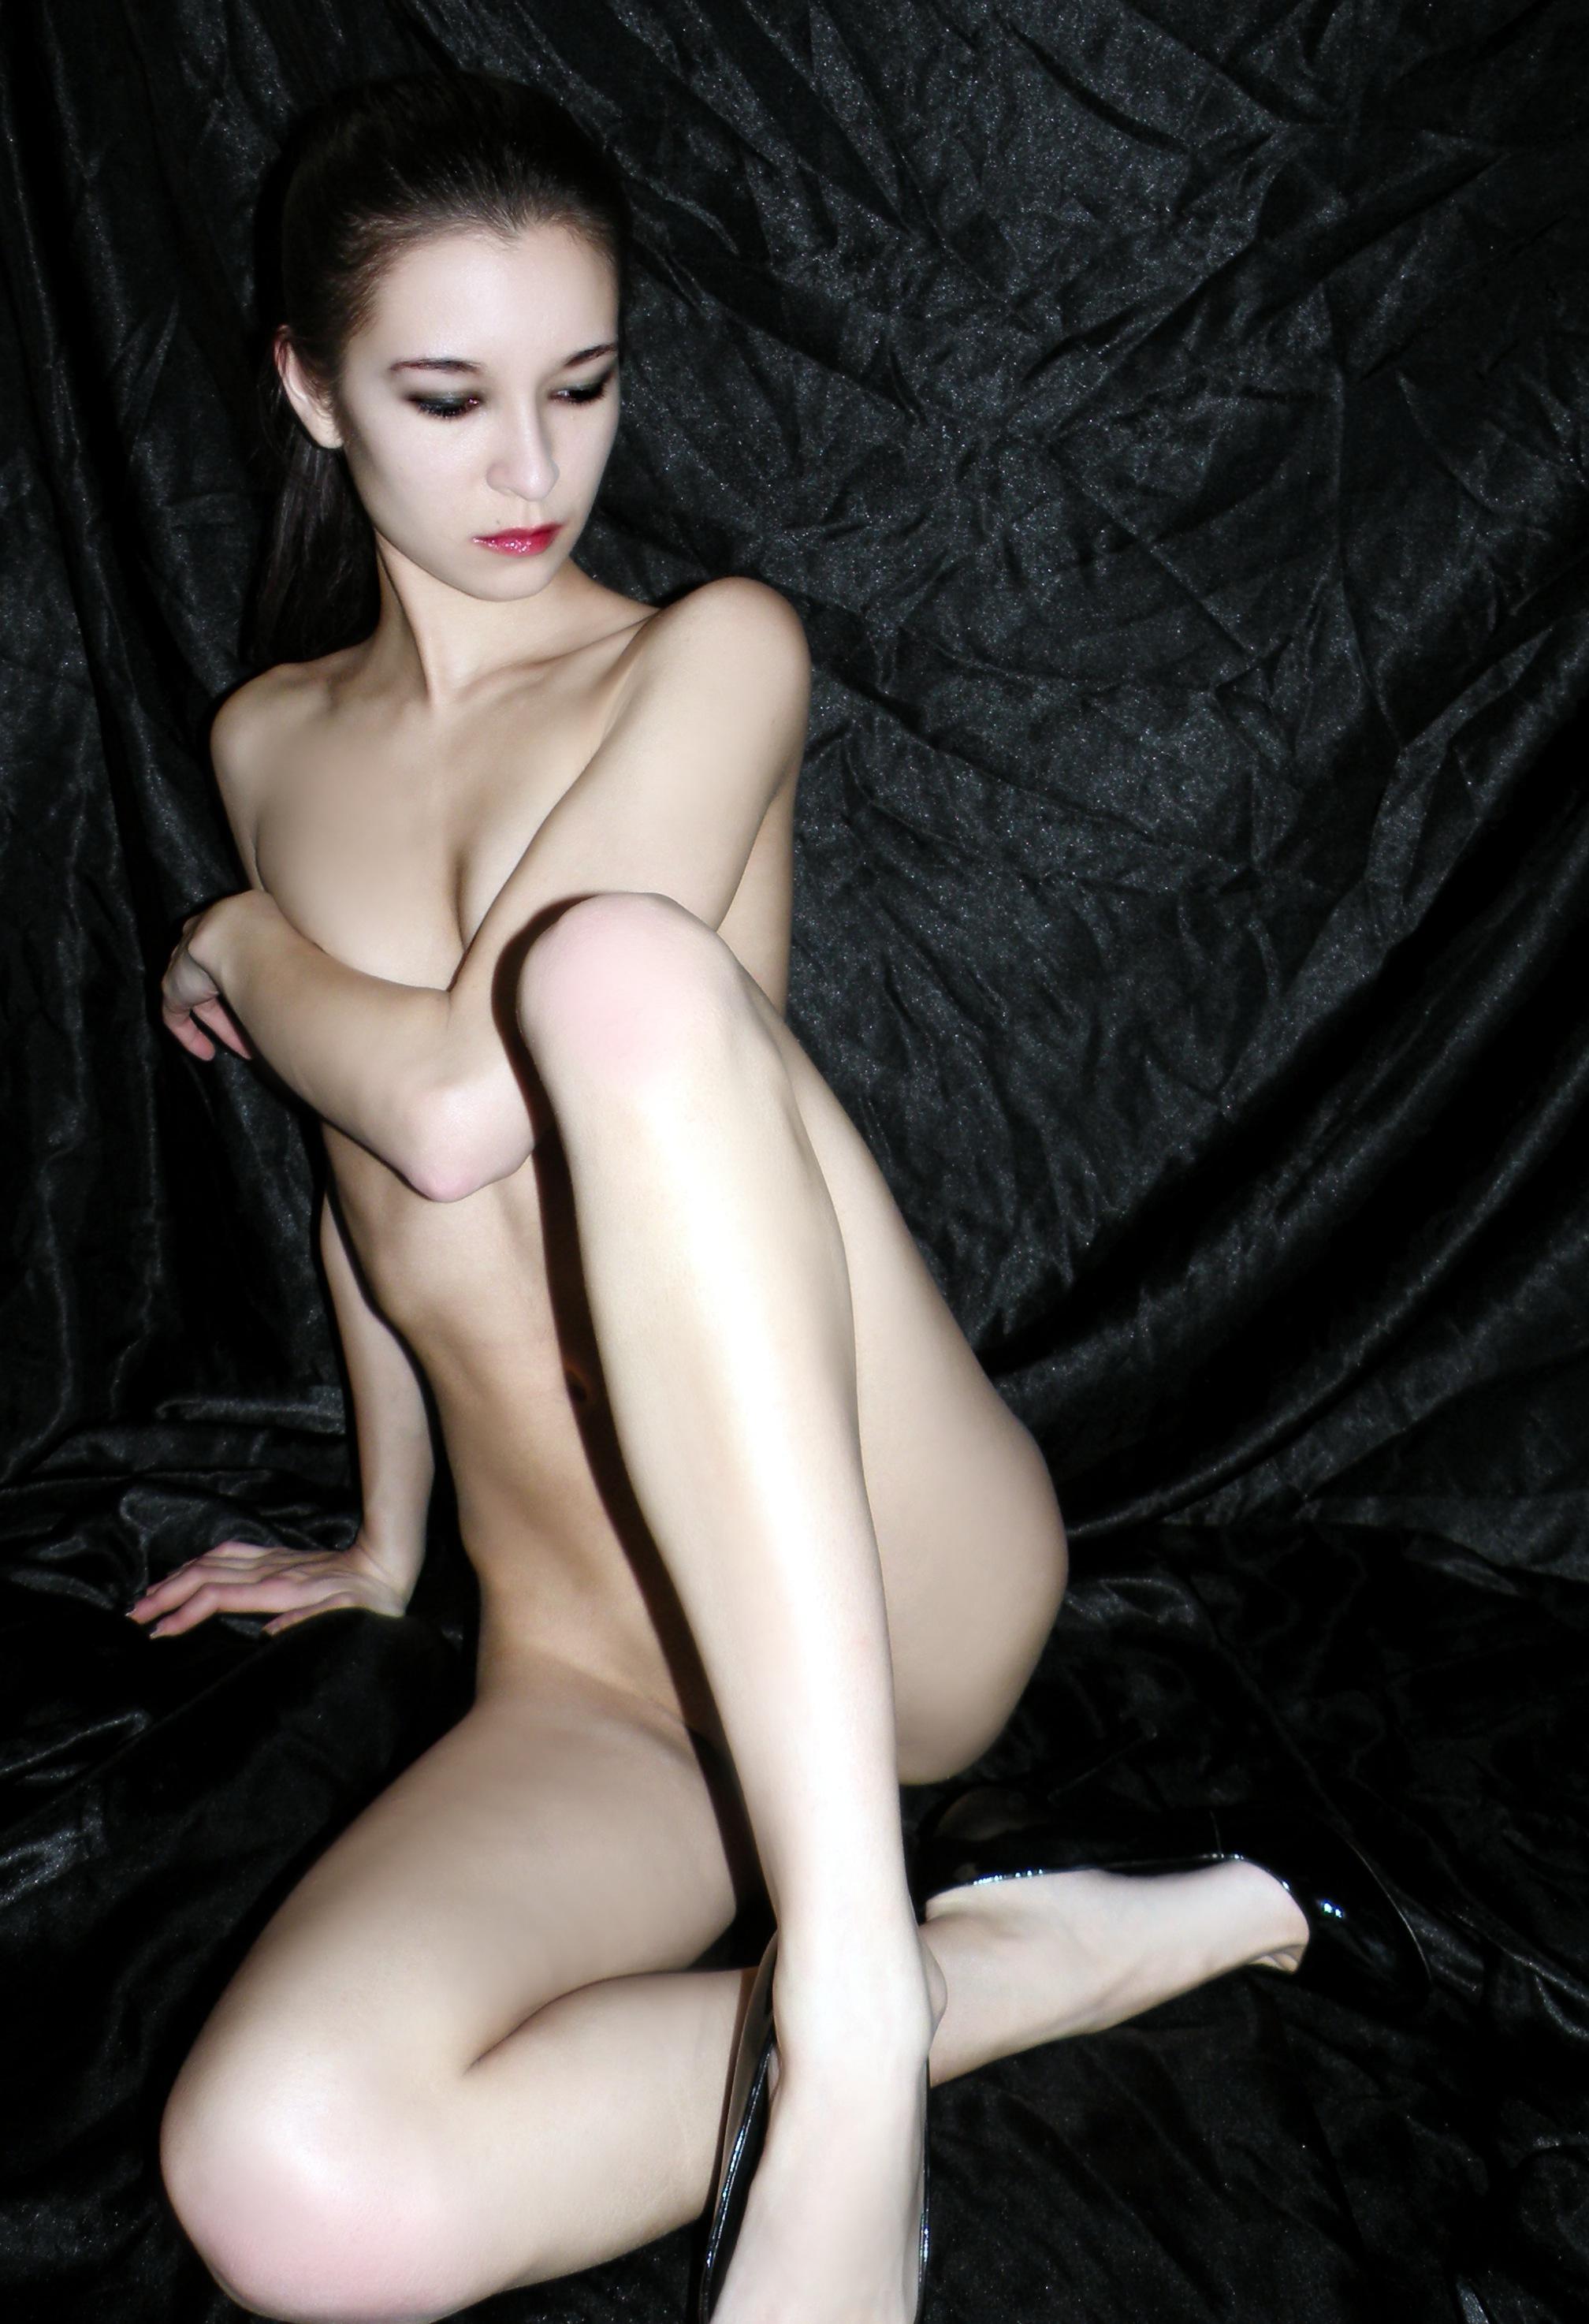 Masuimi max before boob job